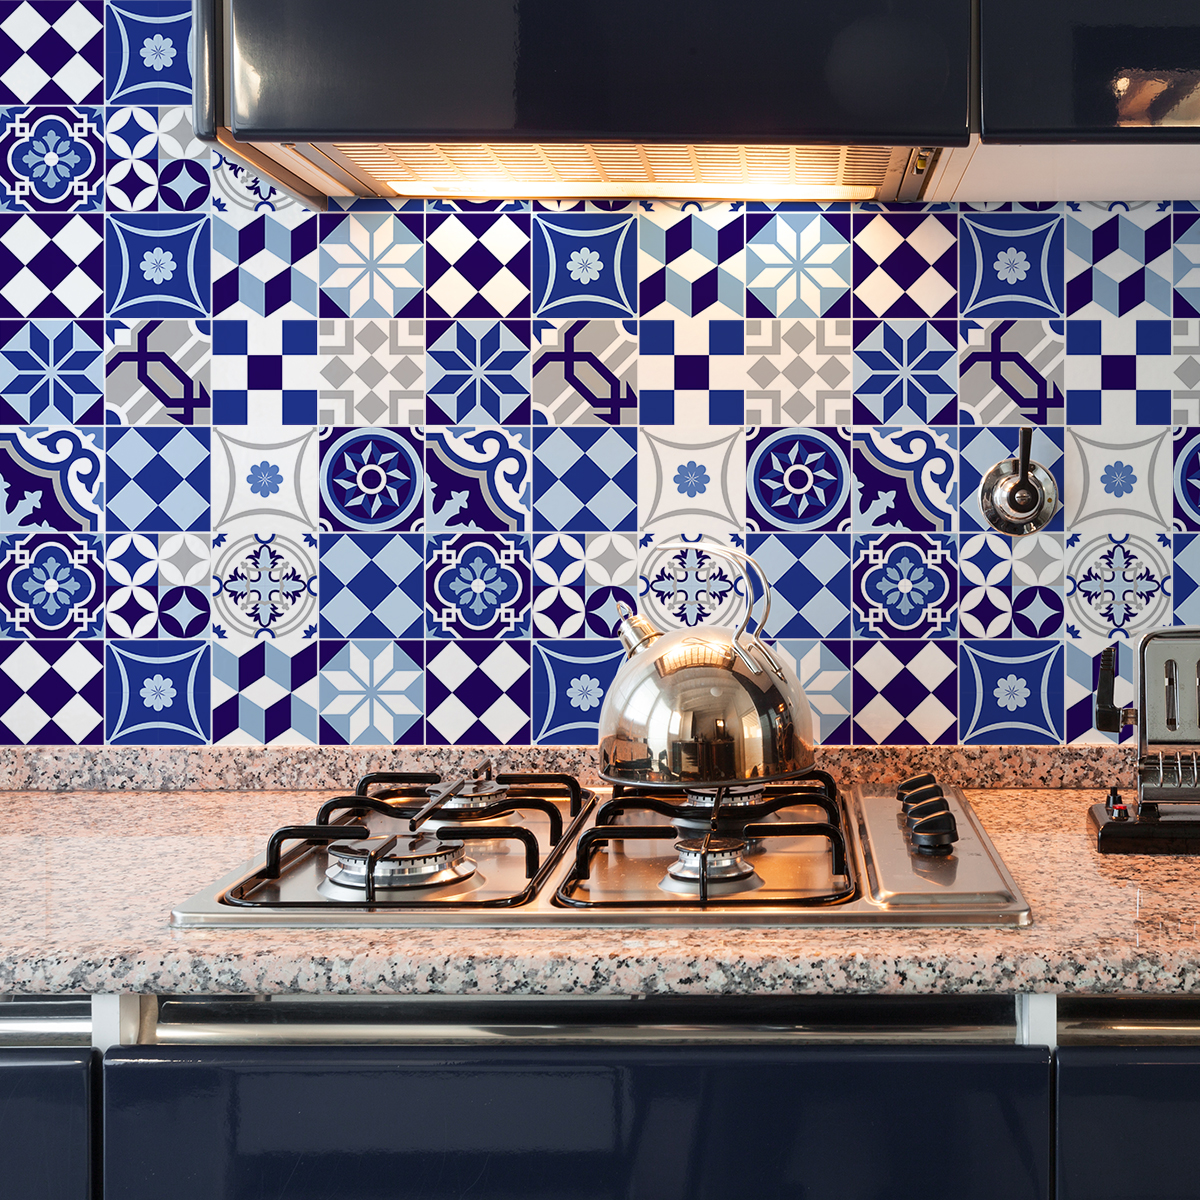 9 stickers carreaux de ciment azulejos gabiana cuisine. Black Bedroom Furniture Sets. Home Design Ideas